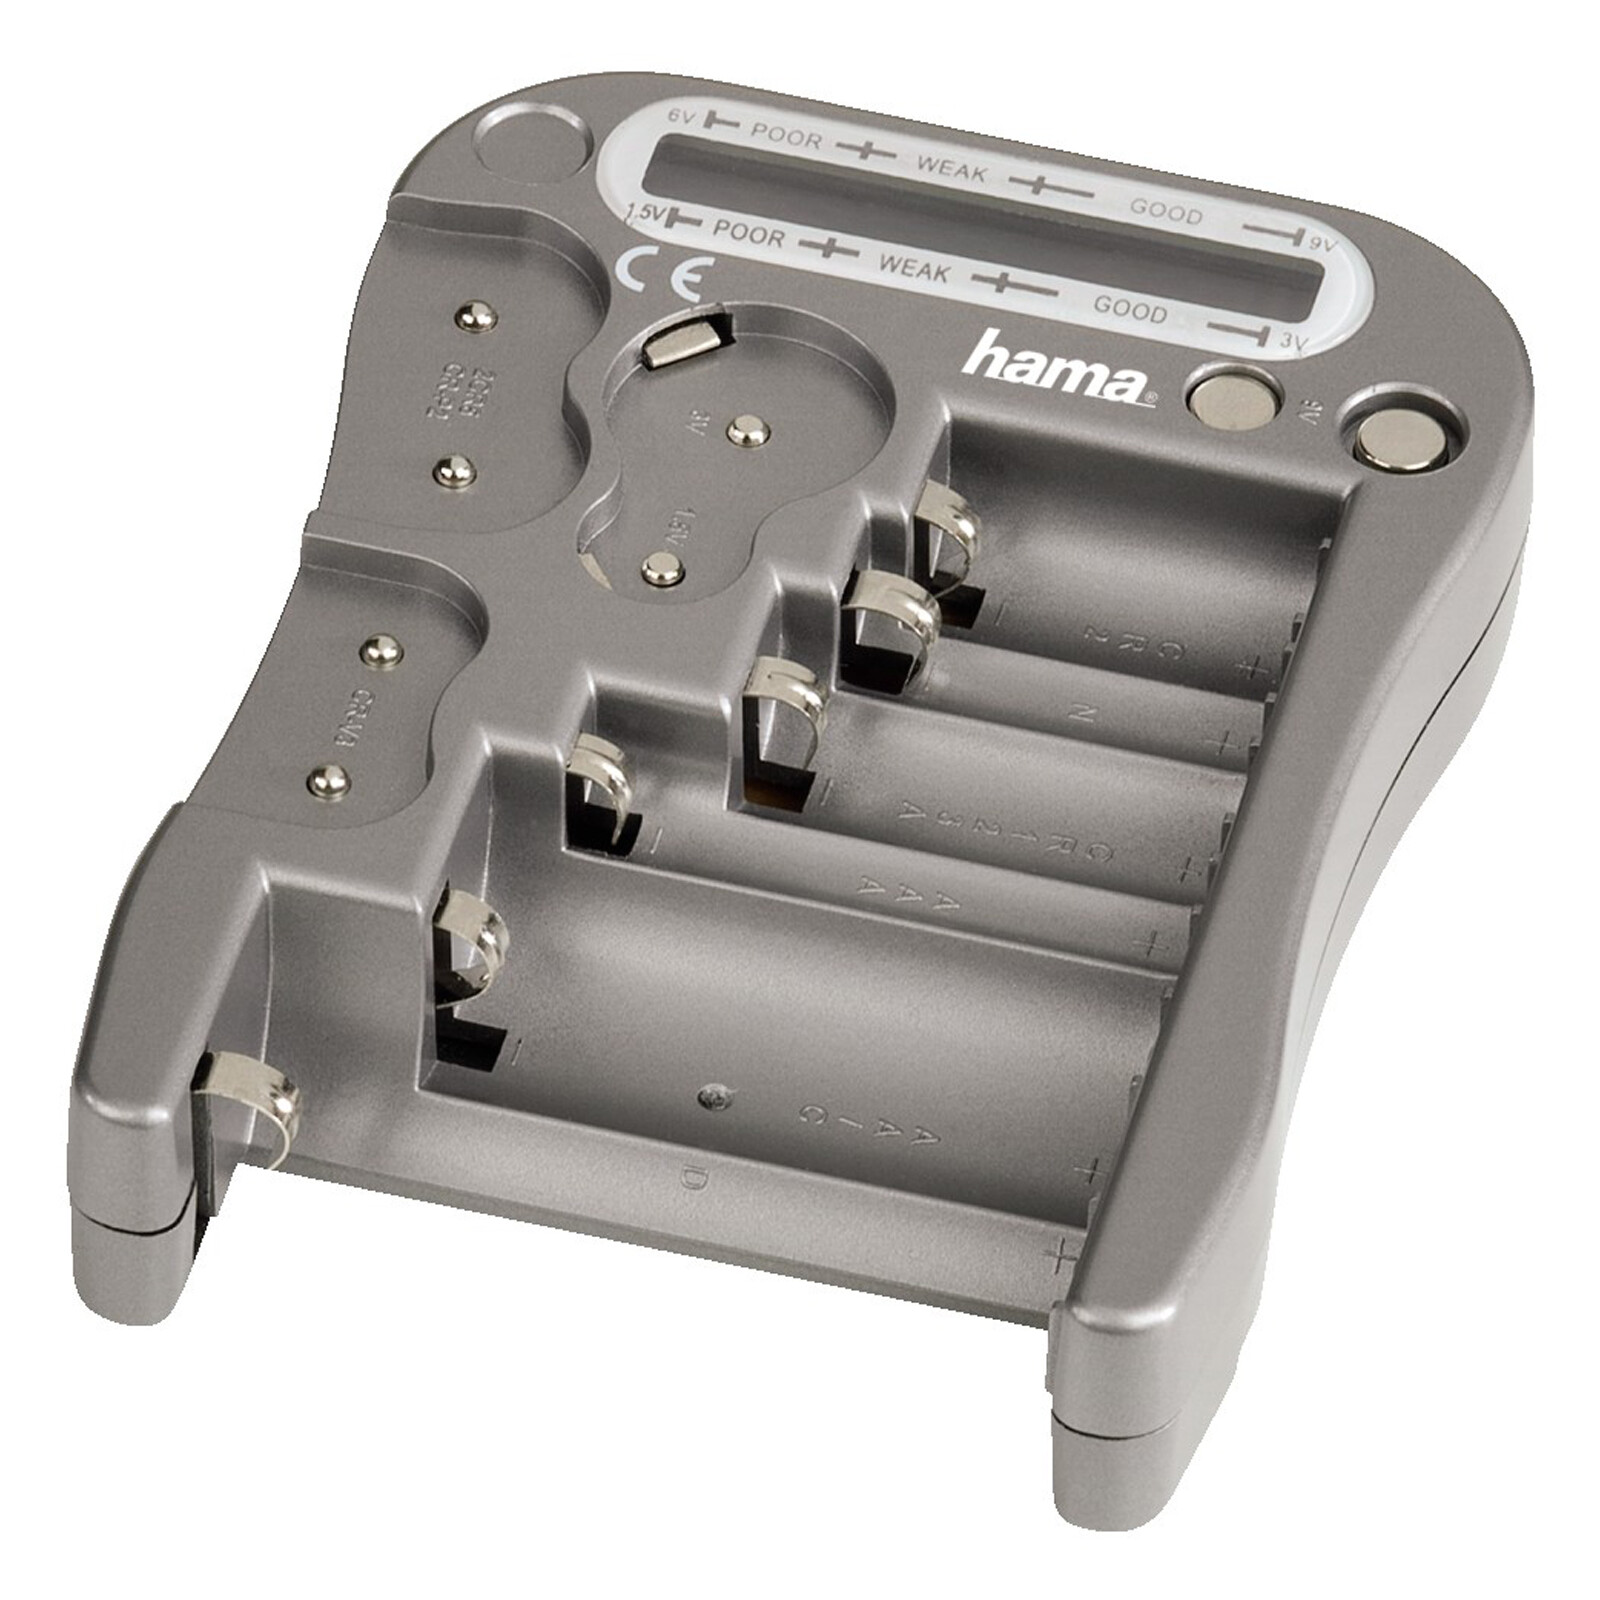 Hama 74021 Akku-/Batterie-Prüfer BT2